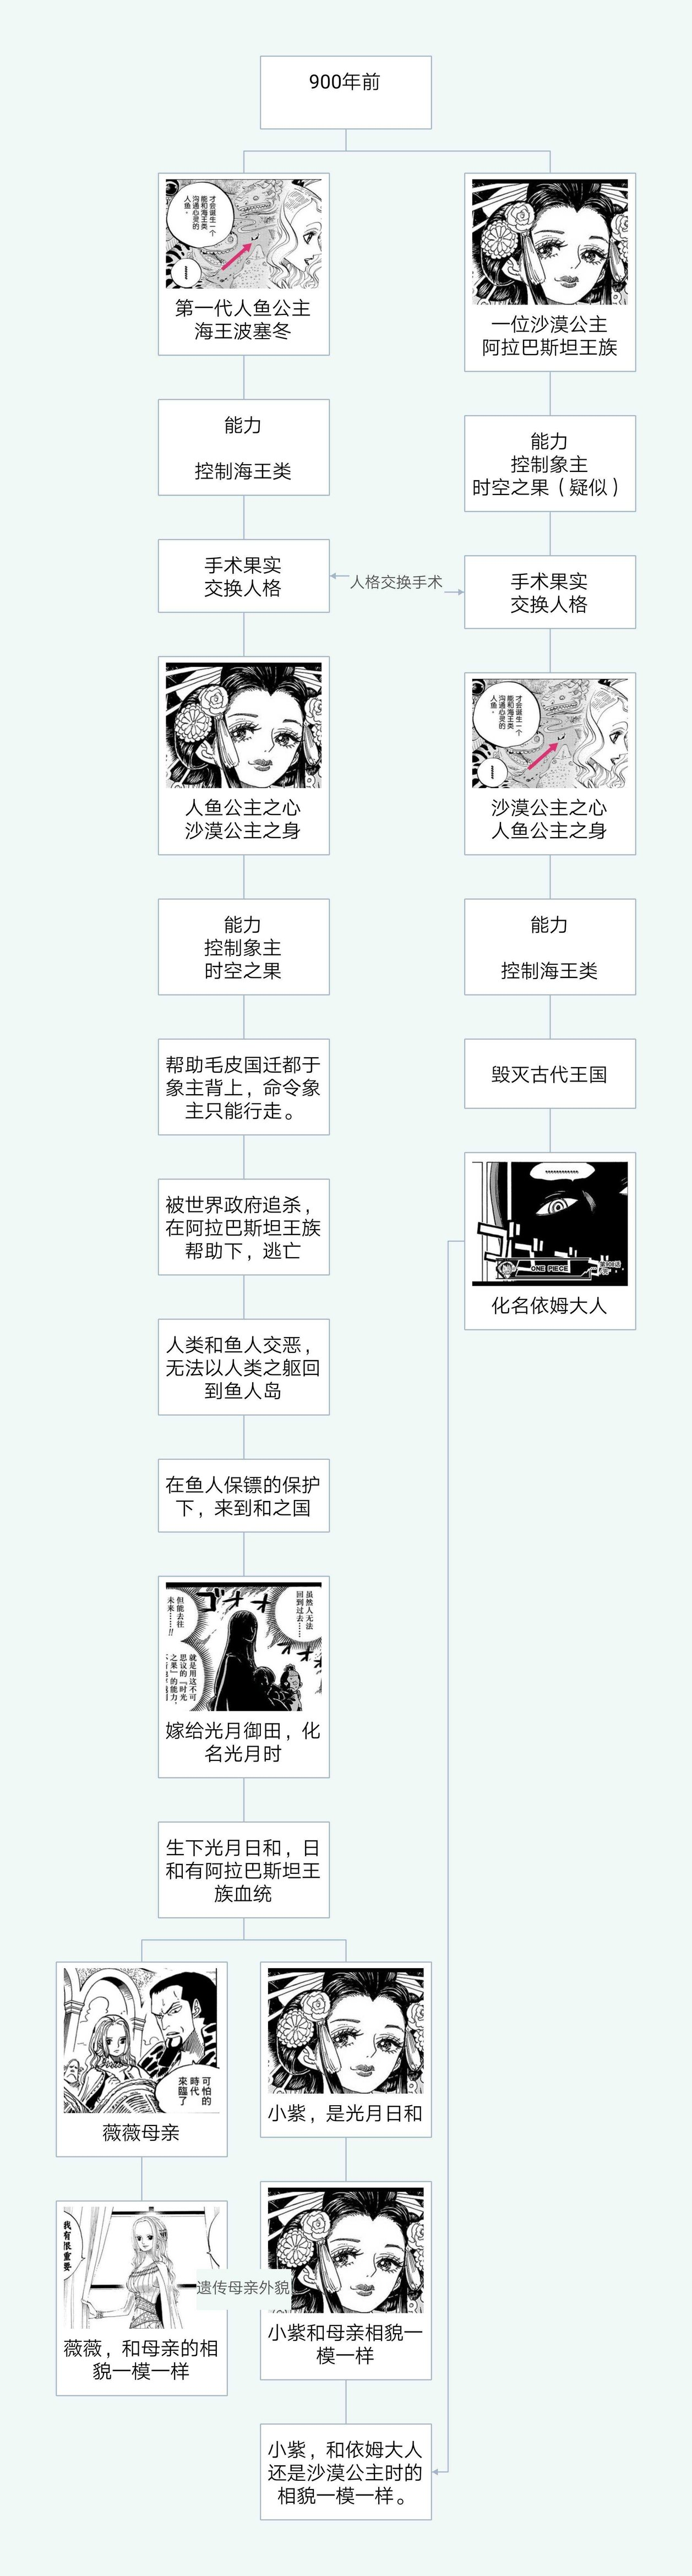 webwxgetmsgimg_gaitubao_com_1257x4678.jpg